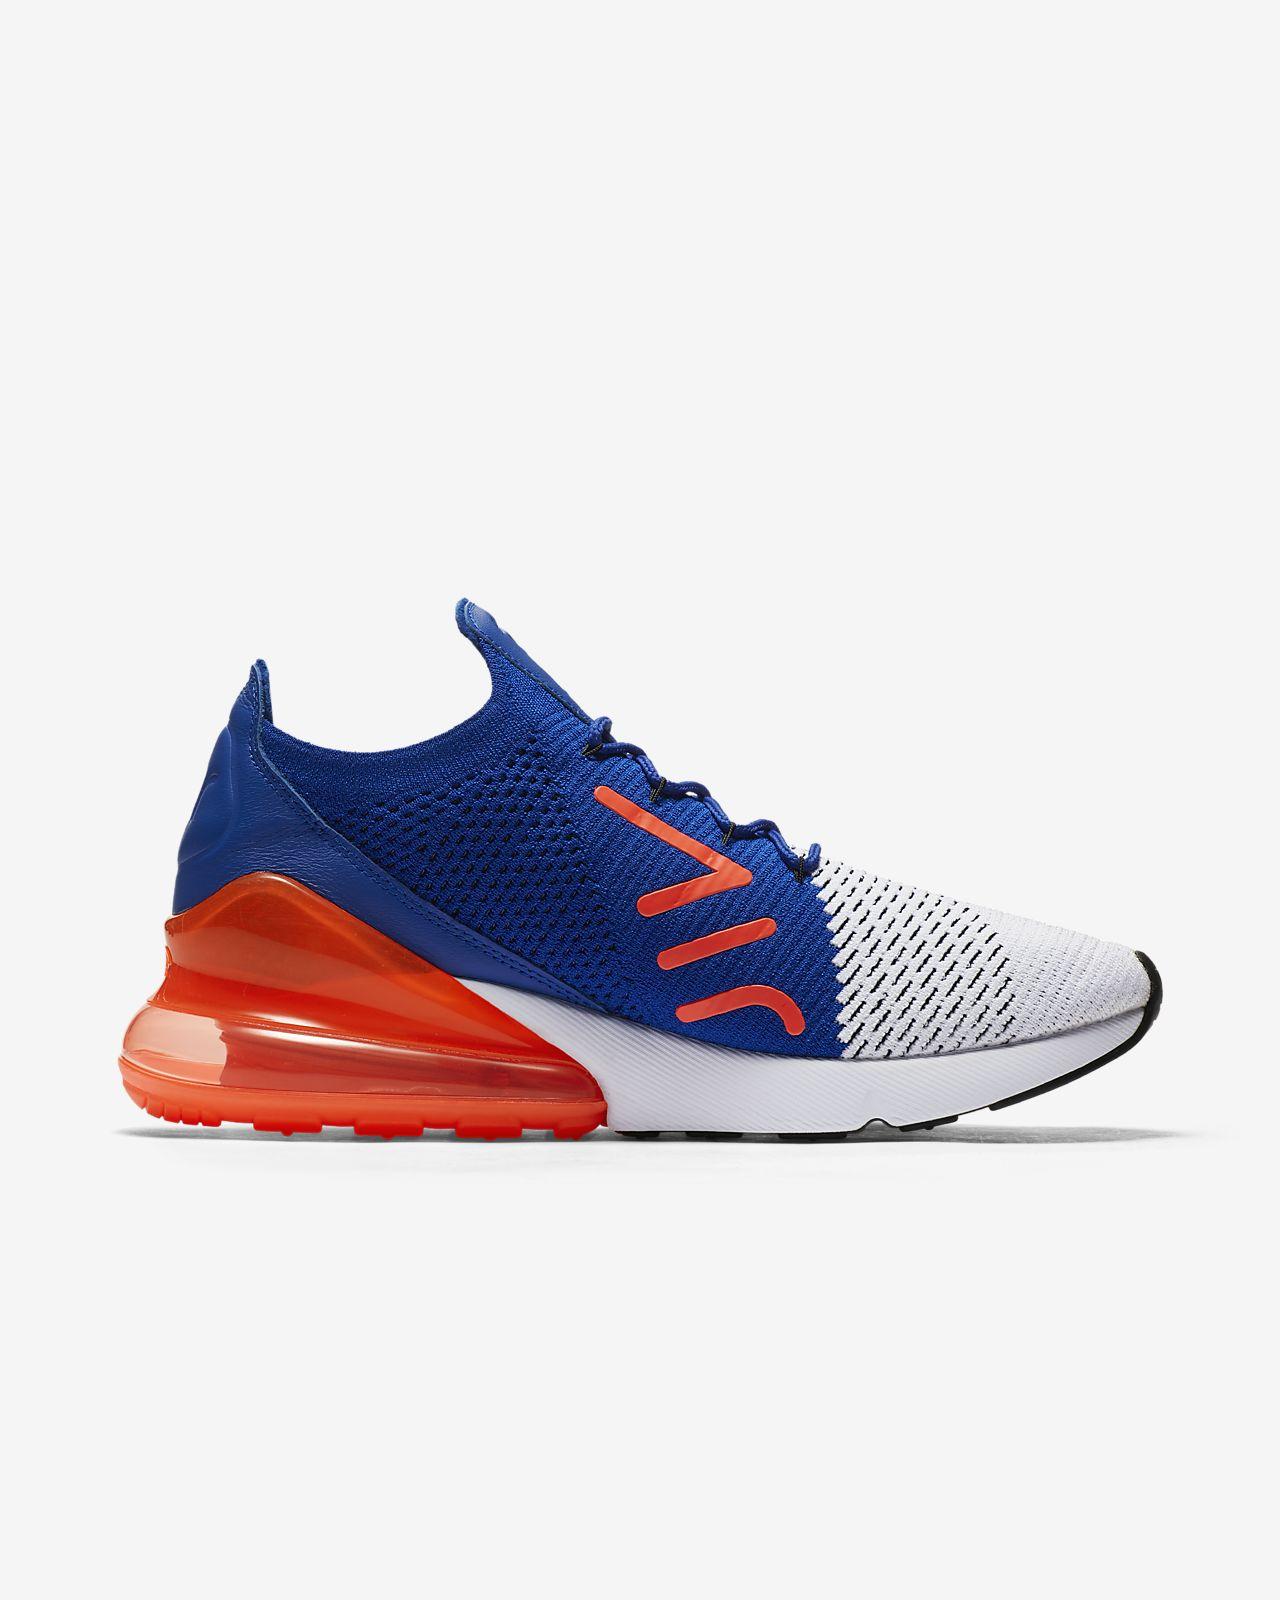 Nike Air Max 270 Flyknit Men's Shoe